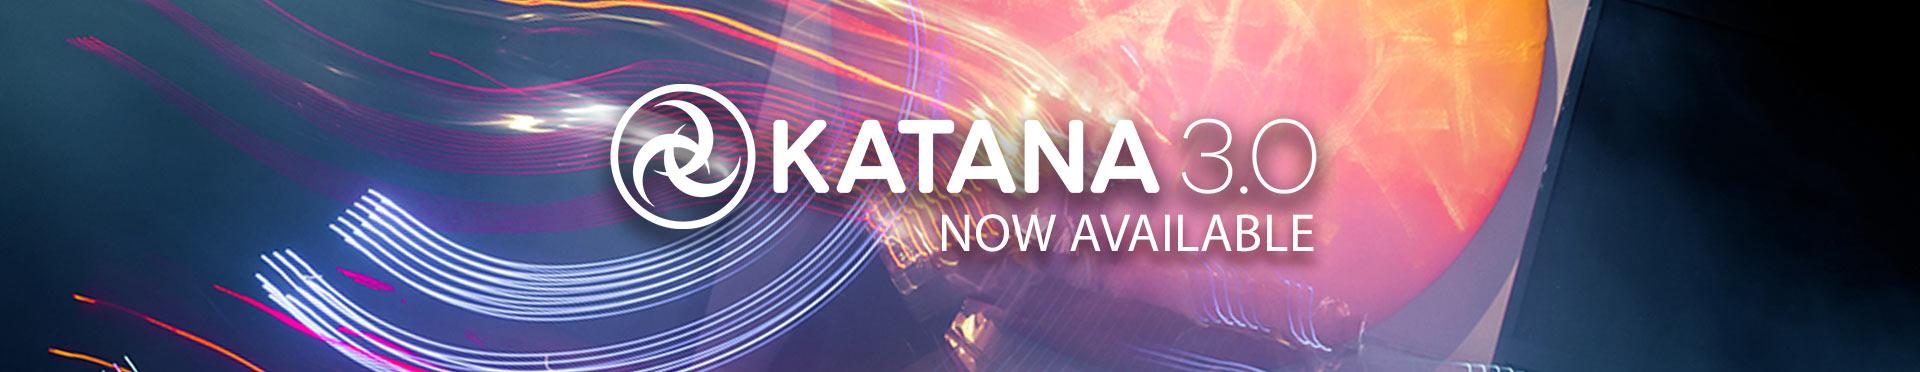 Katana 3.0 out now